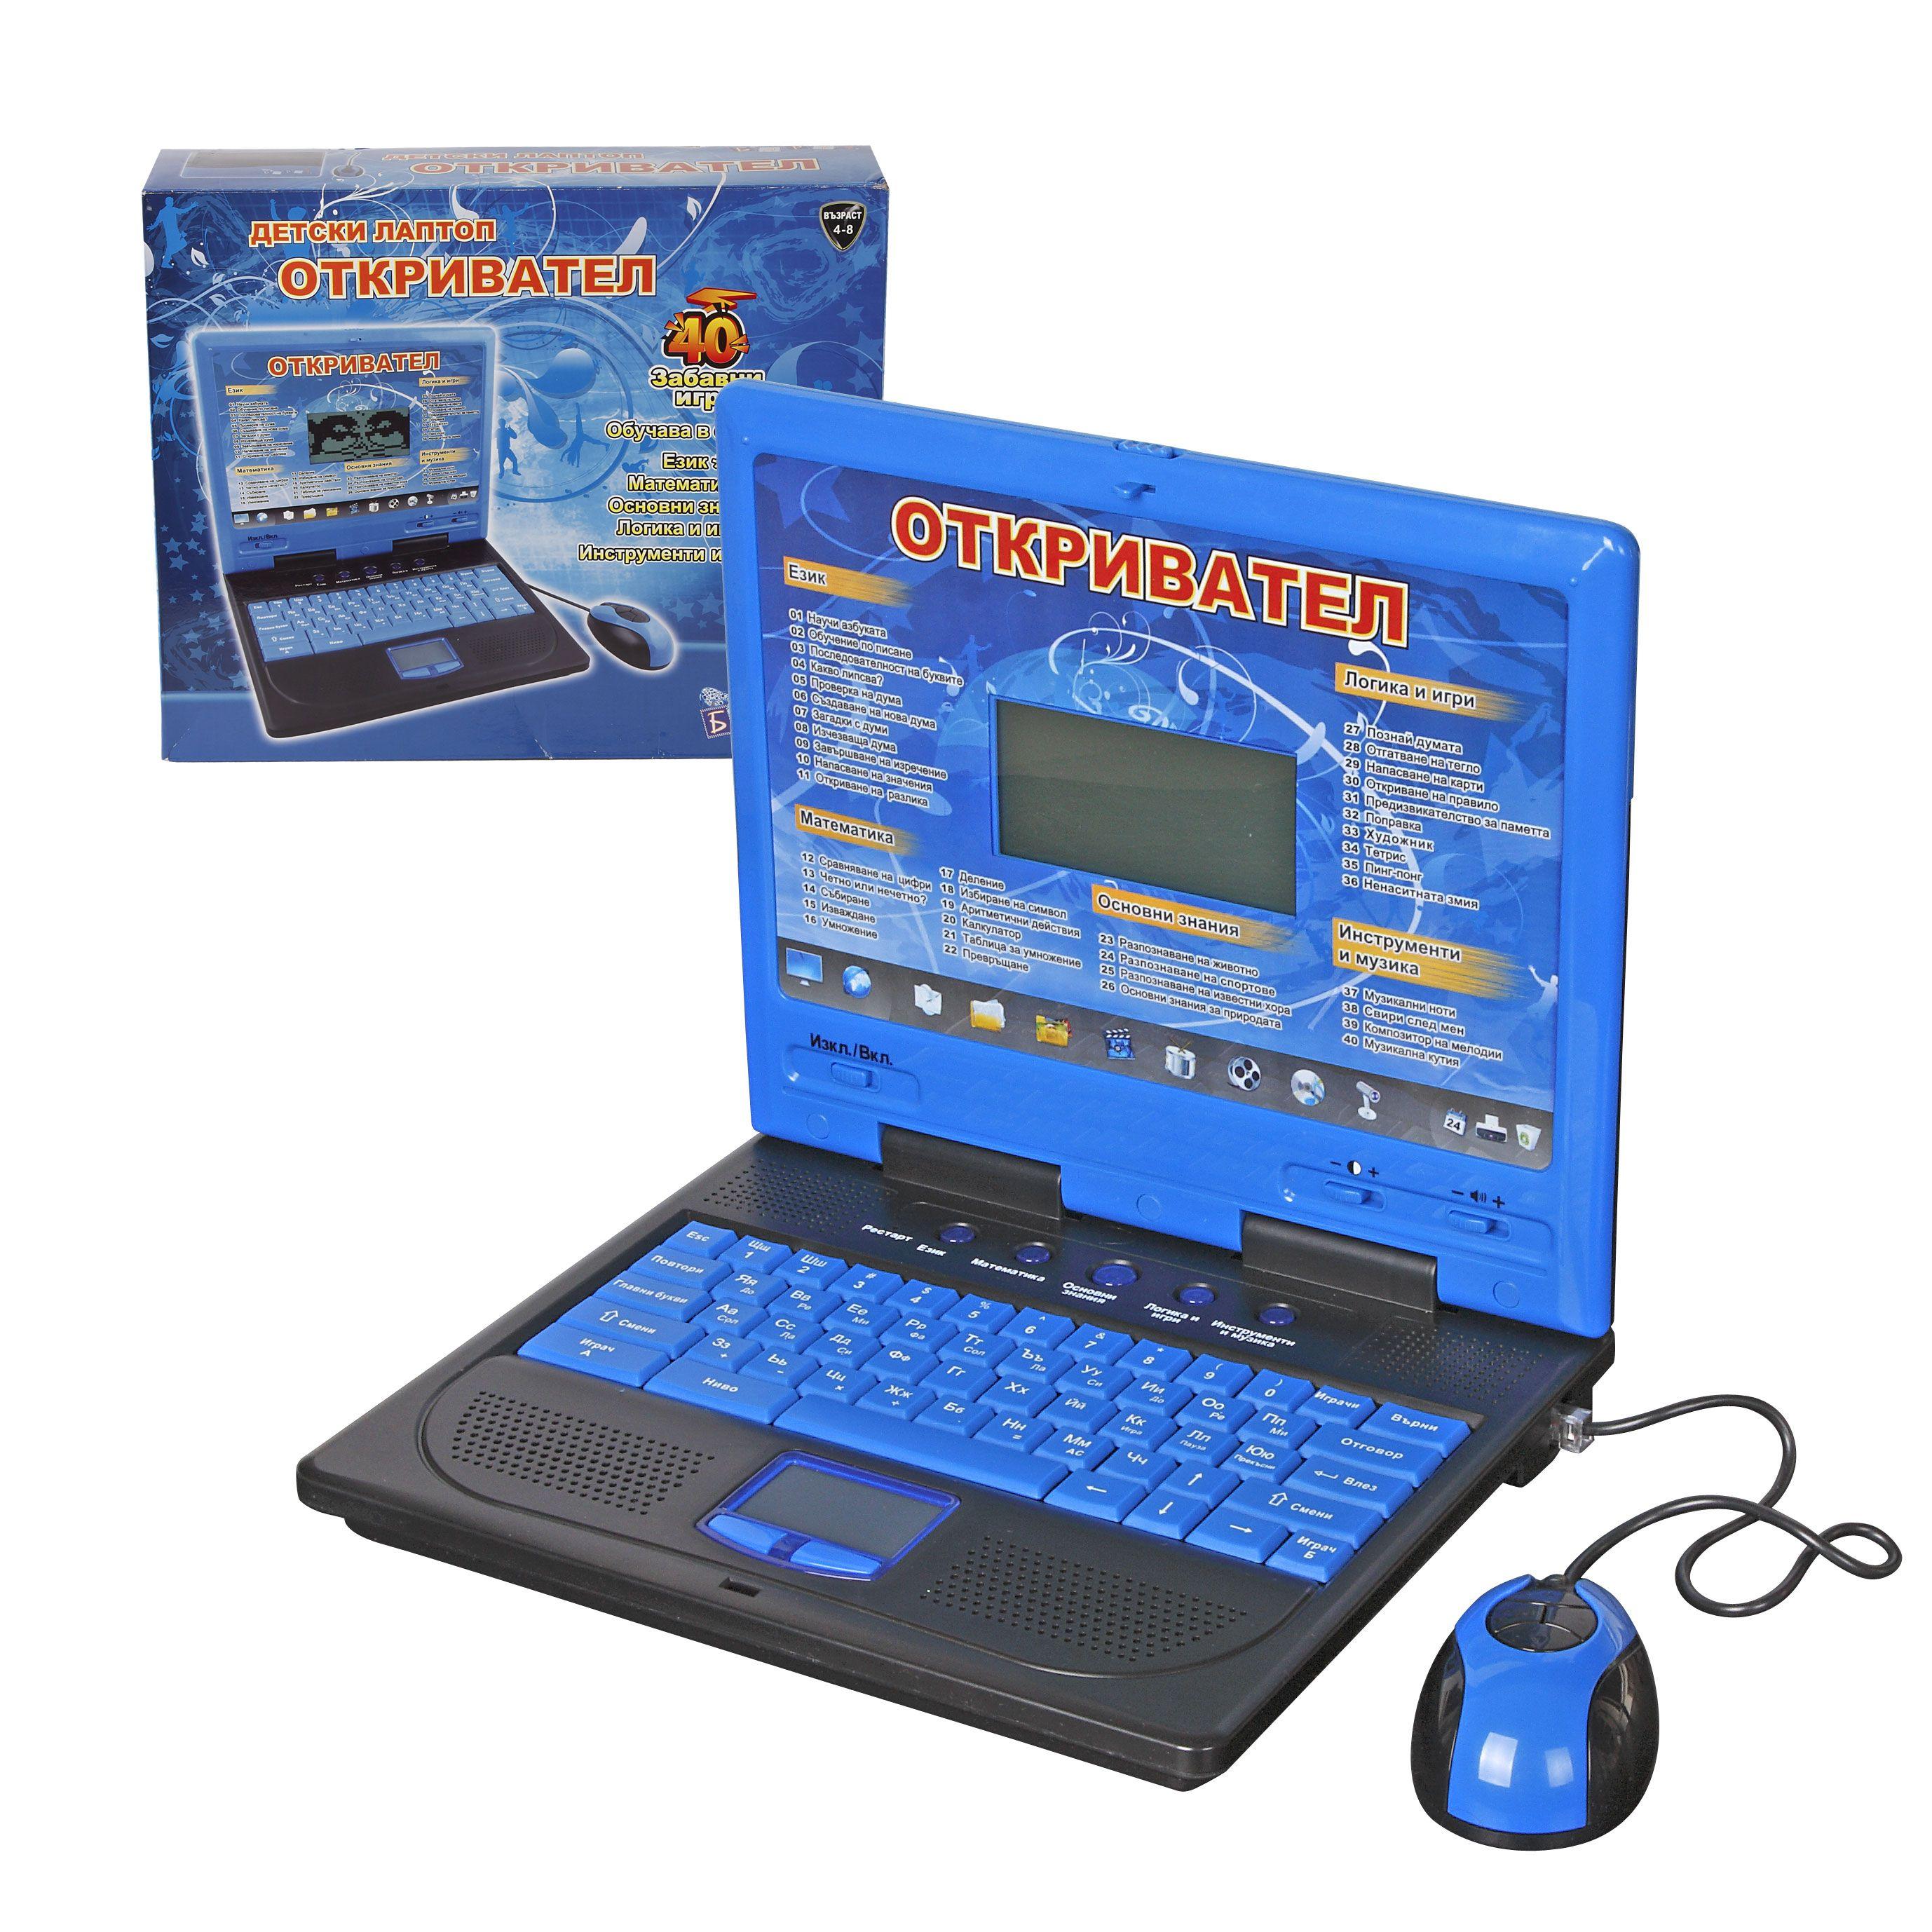 ДЕТСКА ОБРАЗОВАТЕЛНА ИГРАЧКА ЛАПТОП ОТКРИВАТЕЛ http://www.tendenciozen.com/detski-igrachki/detski-obrazovatelni-igrachki/detska-obrazovatelna-igrachka-laptop-otkrivatel-detail